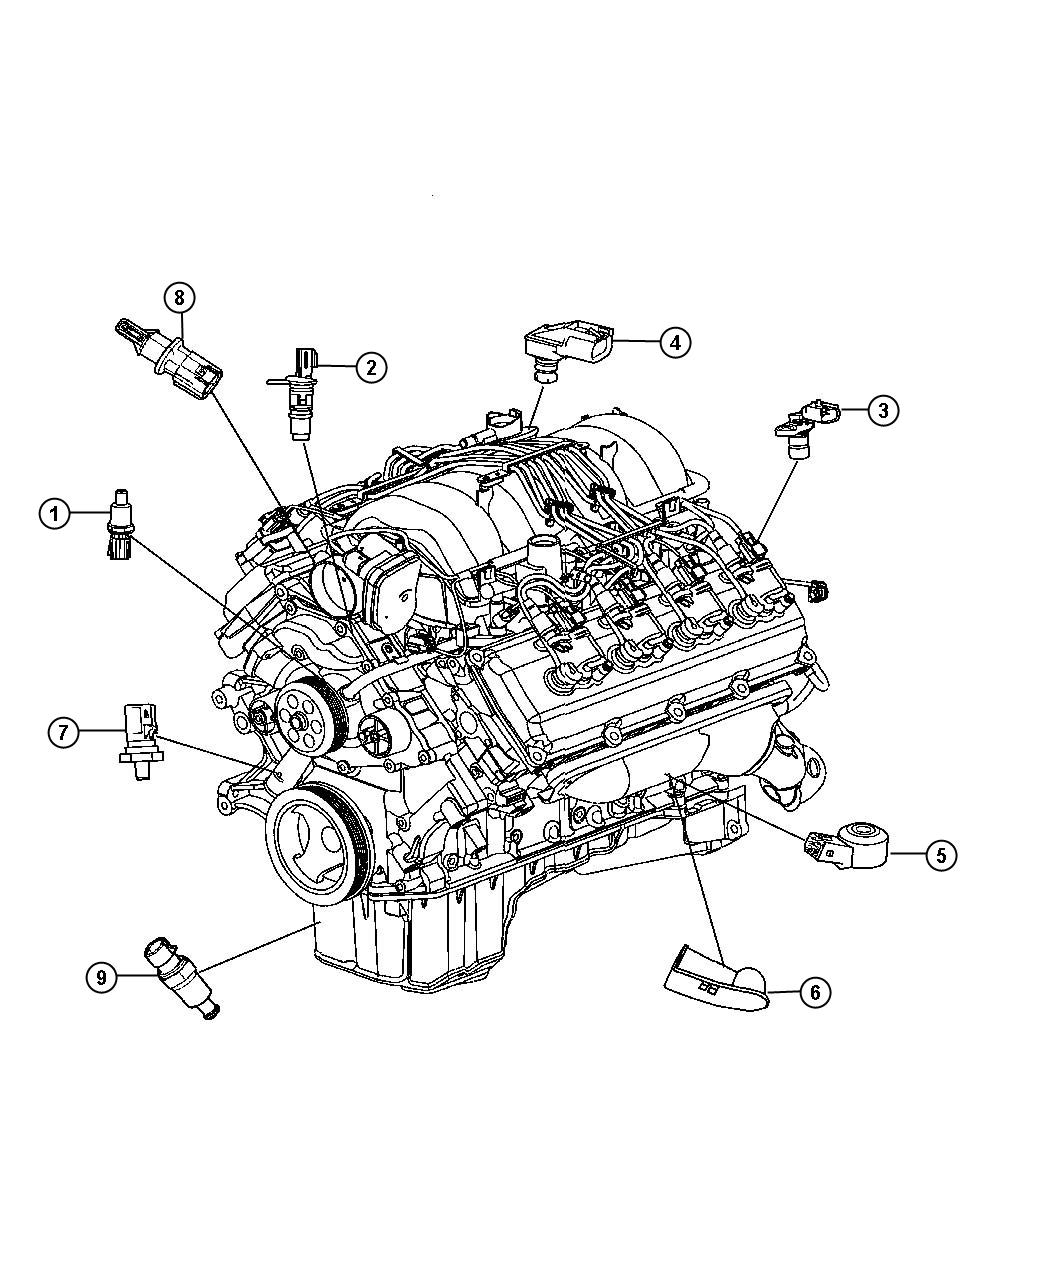 2012 Dodge Challenger Sensor. Crankshaft position. Sensors